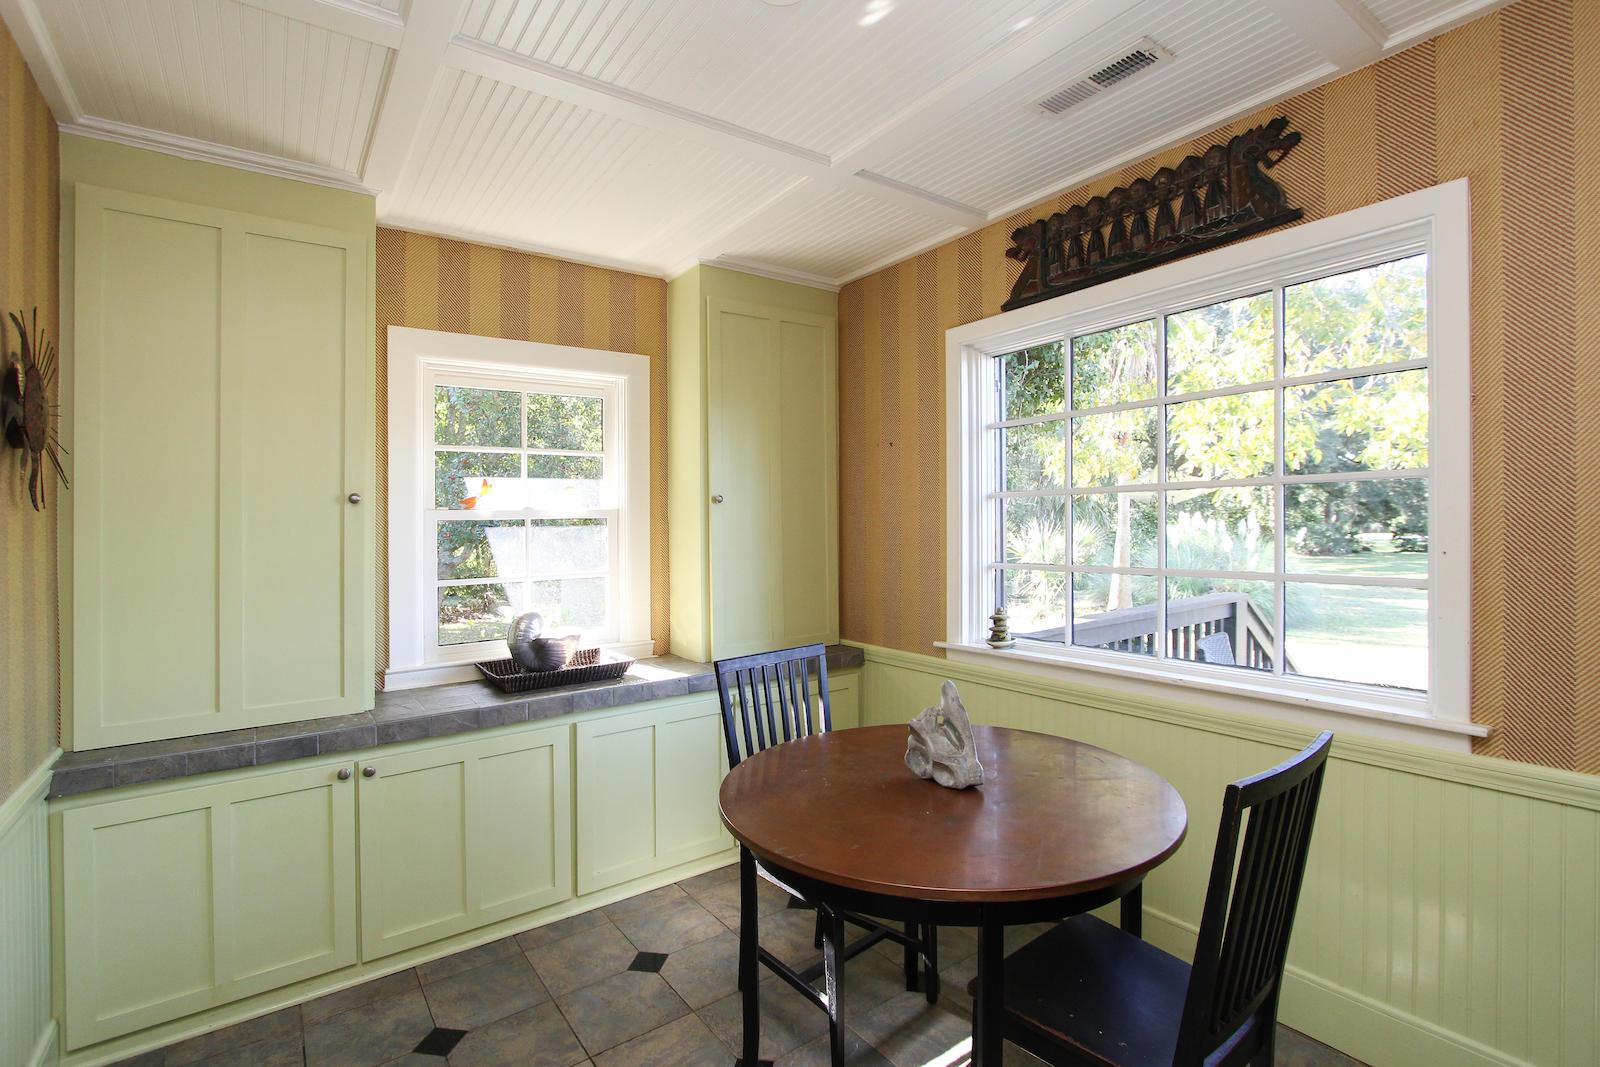 Albemarle Point Homes For Sale - 3 Albemarle, Charleston, SC - 7